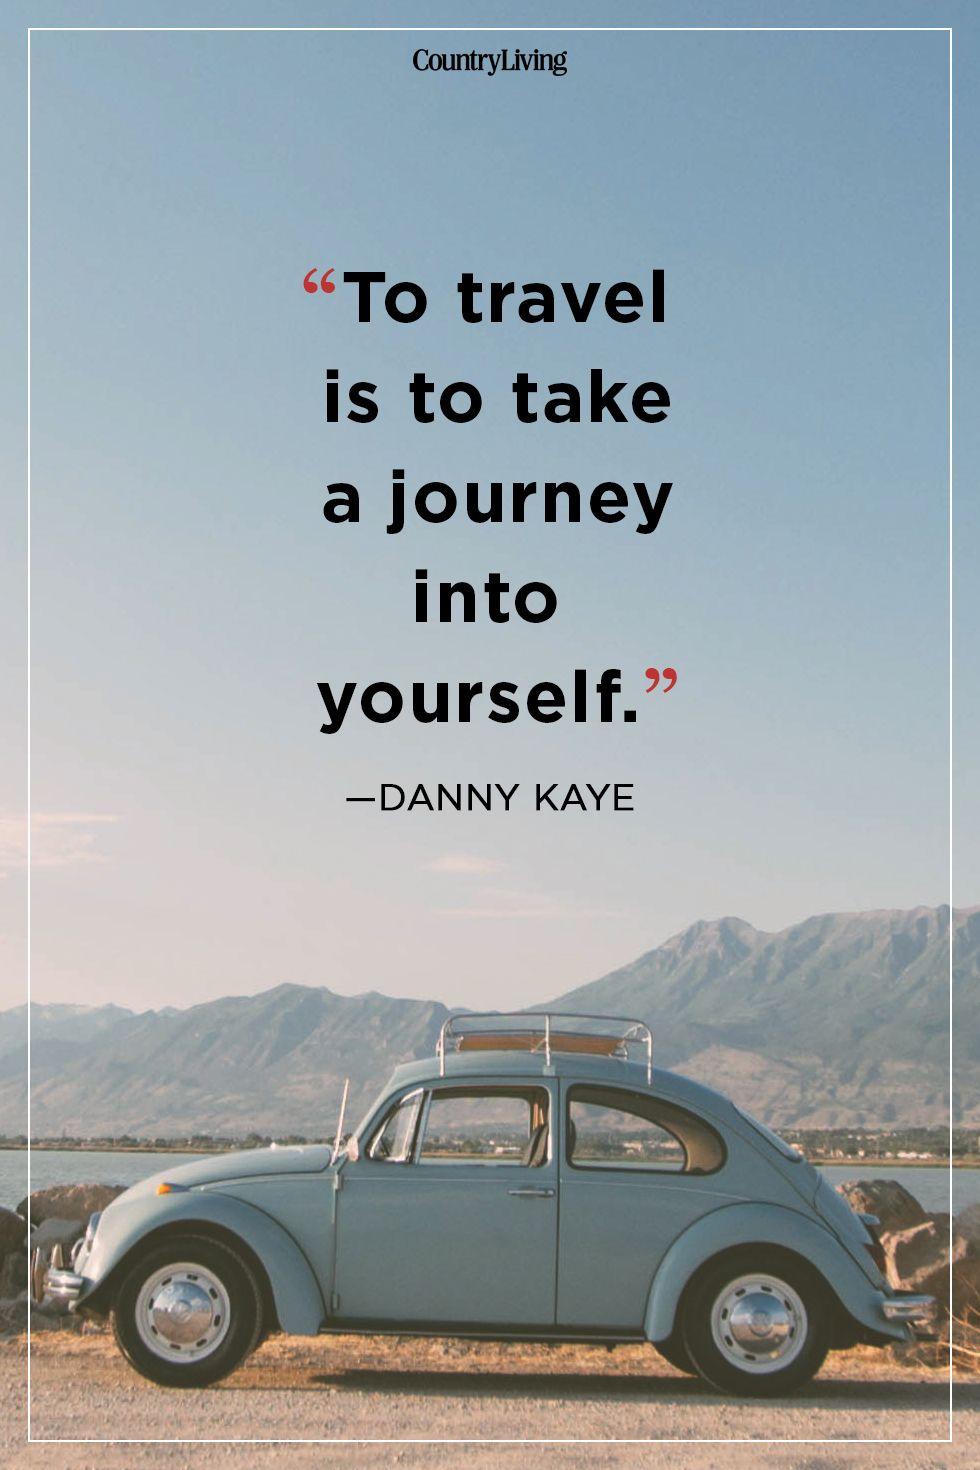 danny kayetravel quote